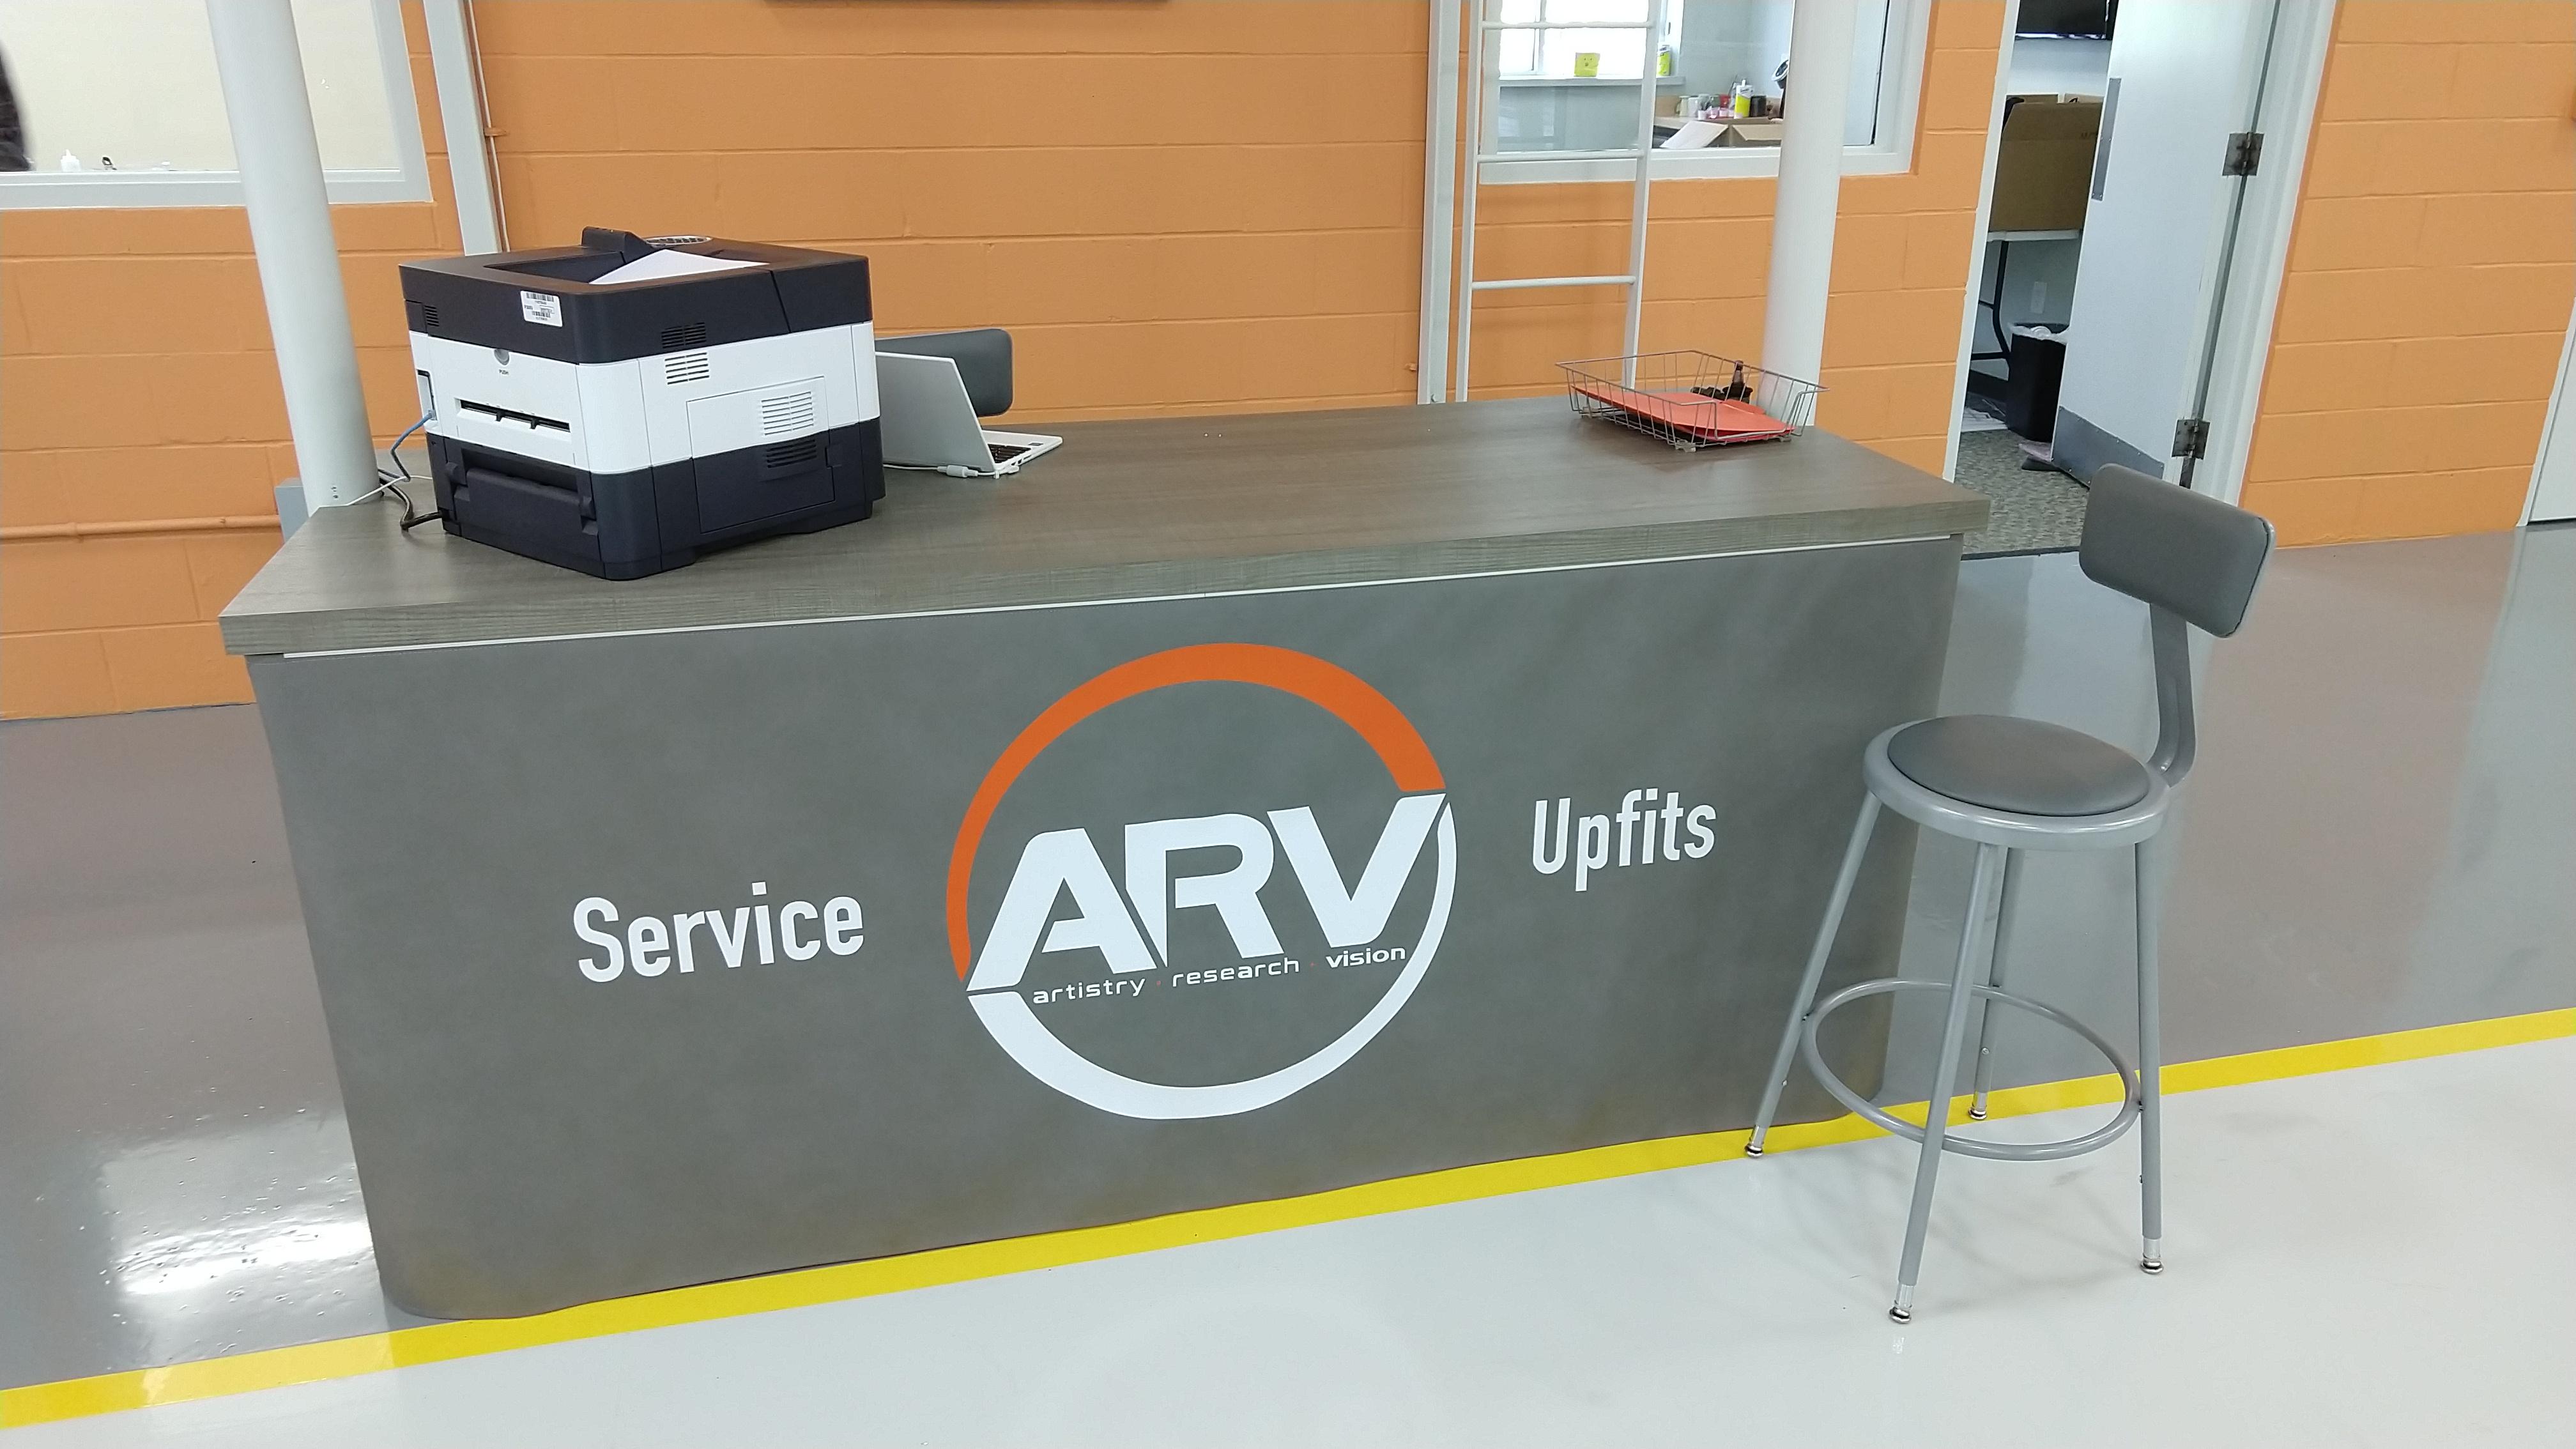 ARV Service Uplifts